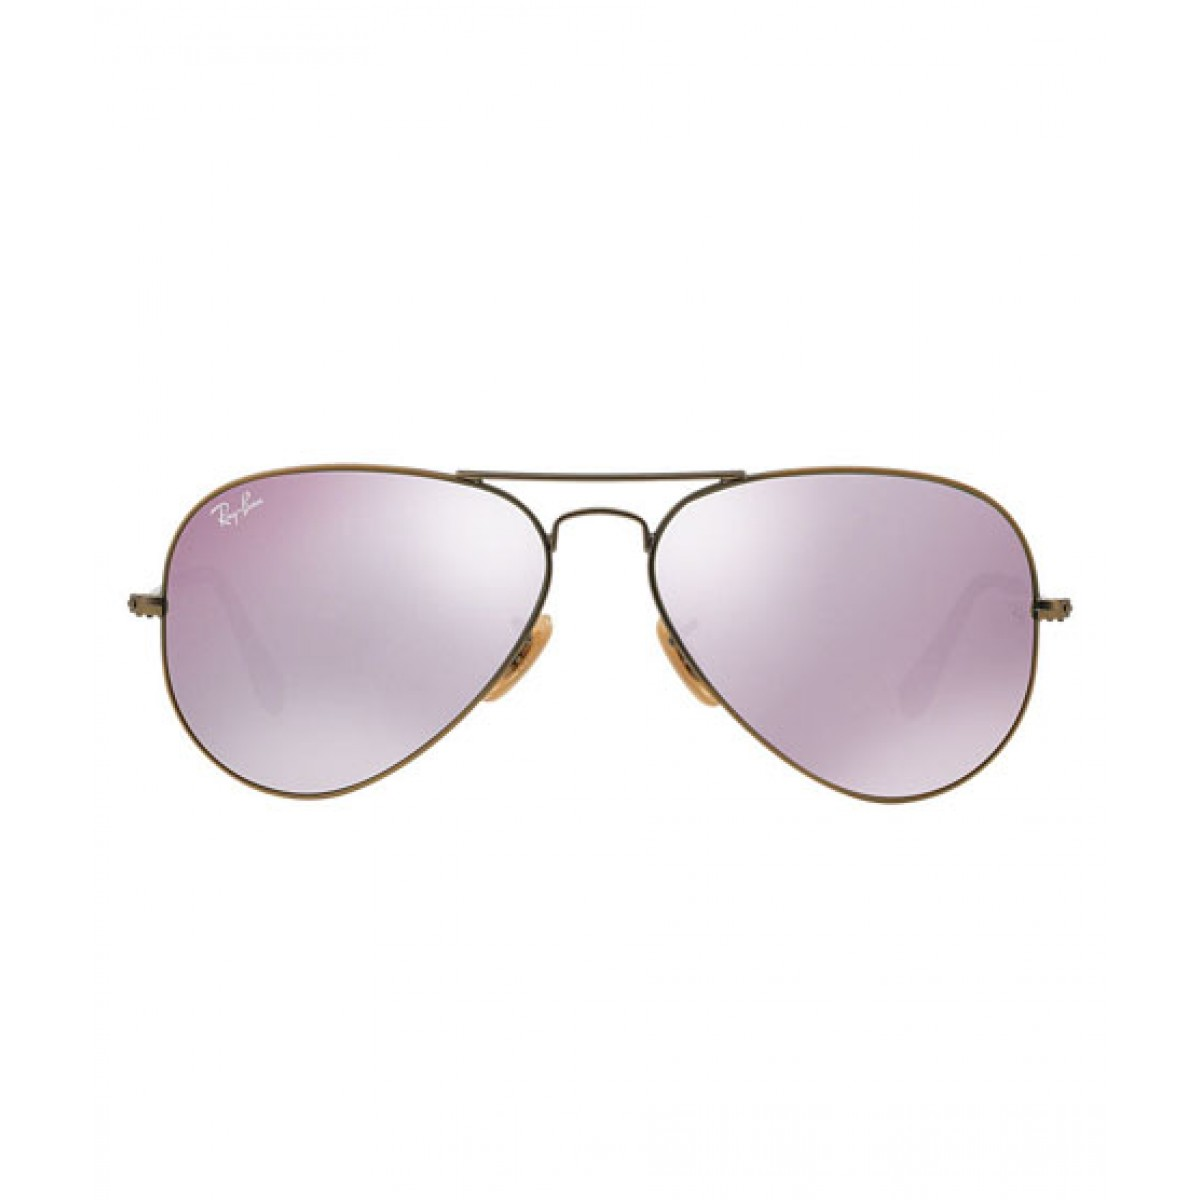 ray ban polarized sunglasses price in pakistan